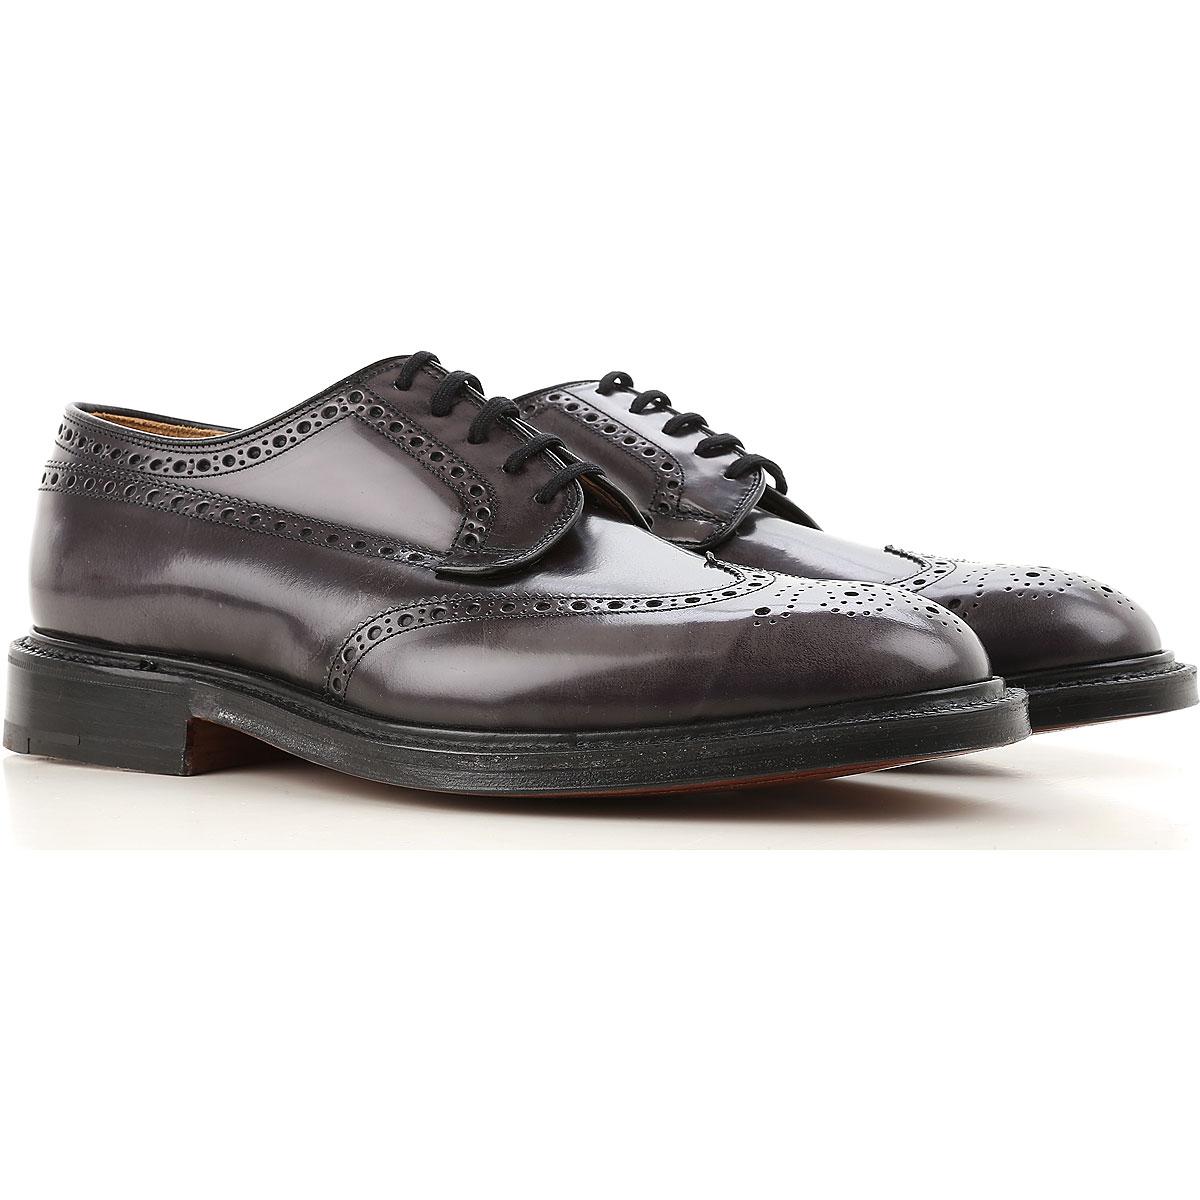 Image of Church's Brogue Shoes On Sale, Dark Asphalt Grey, Leather, 2017, 10 8 9 9.5